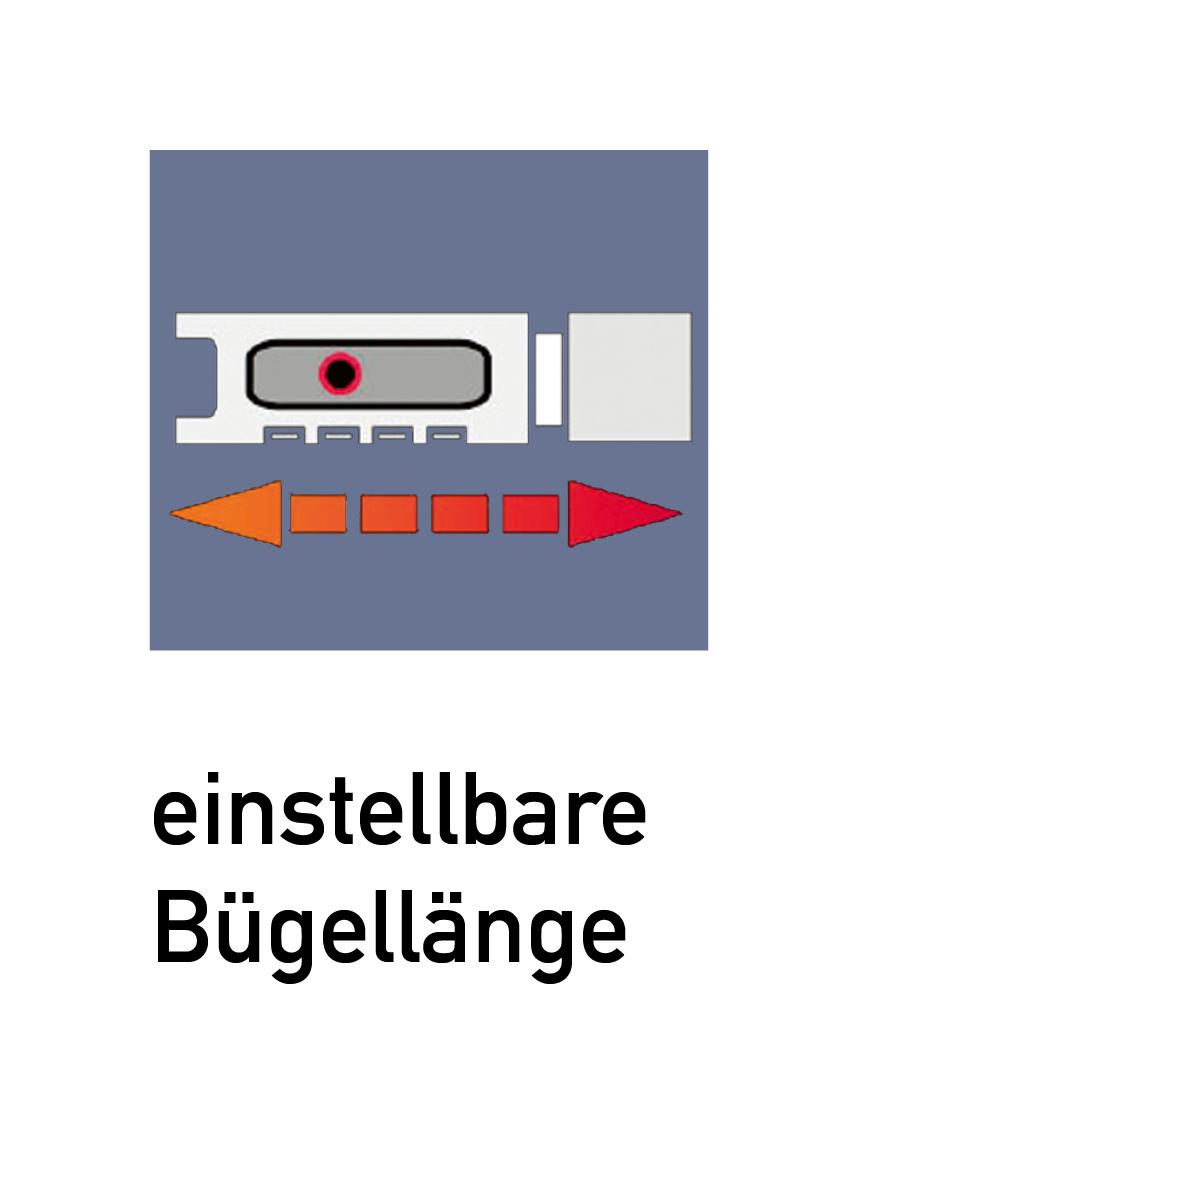 Einstellbare_Buegellaenge